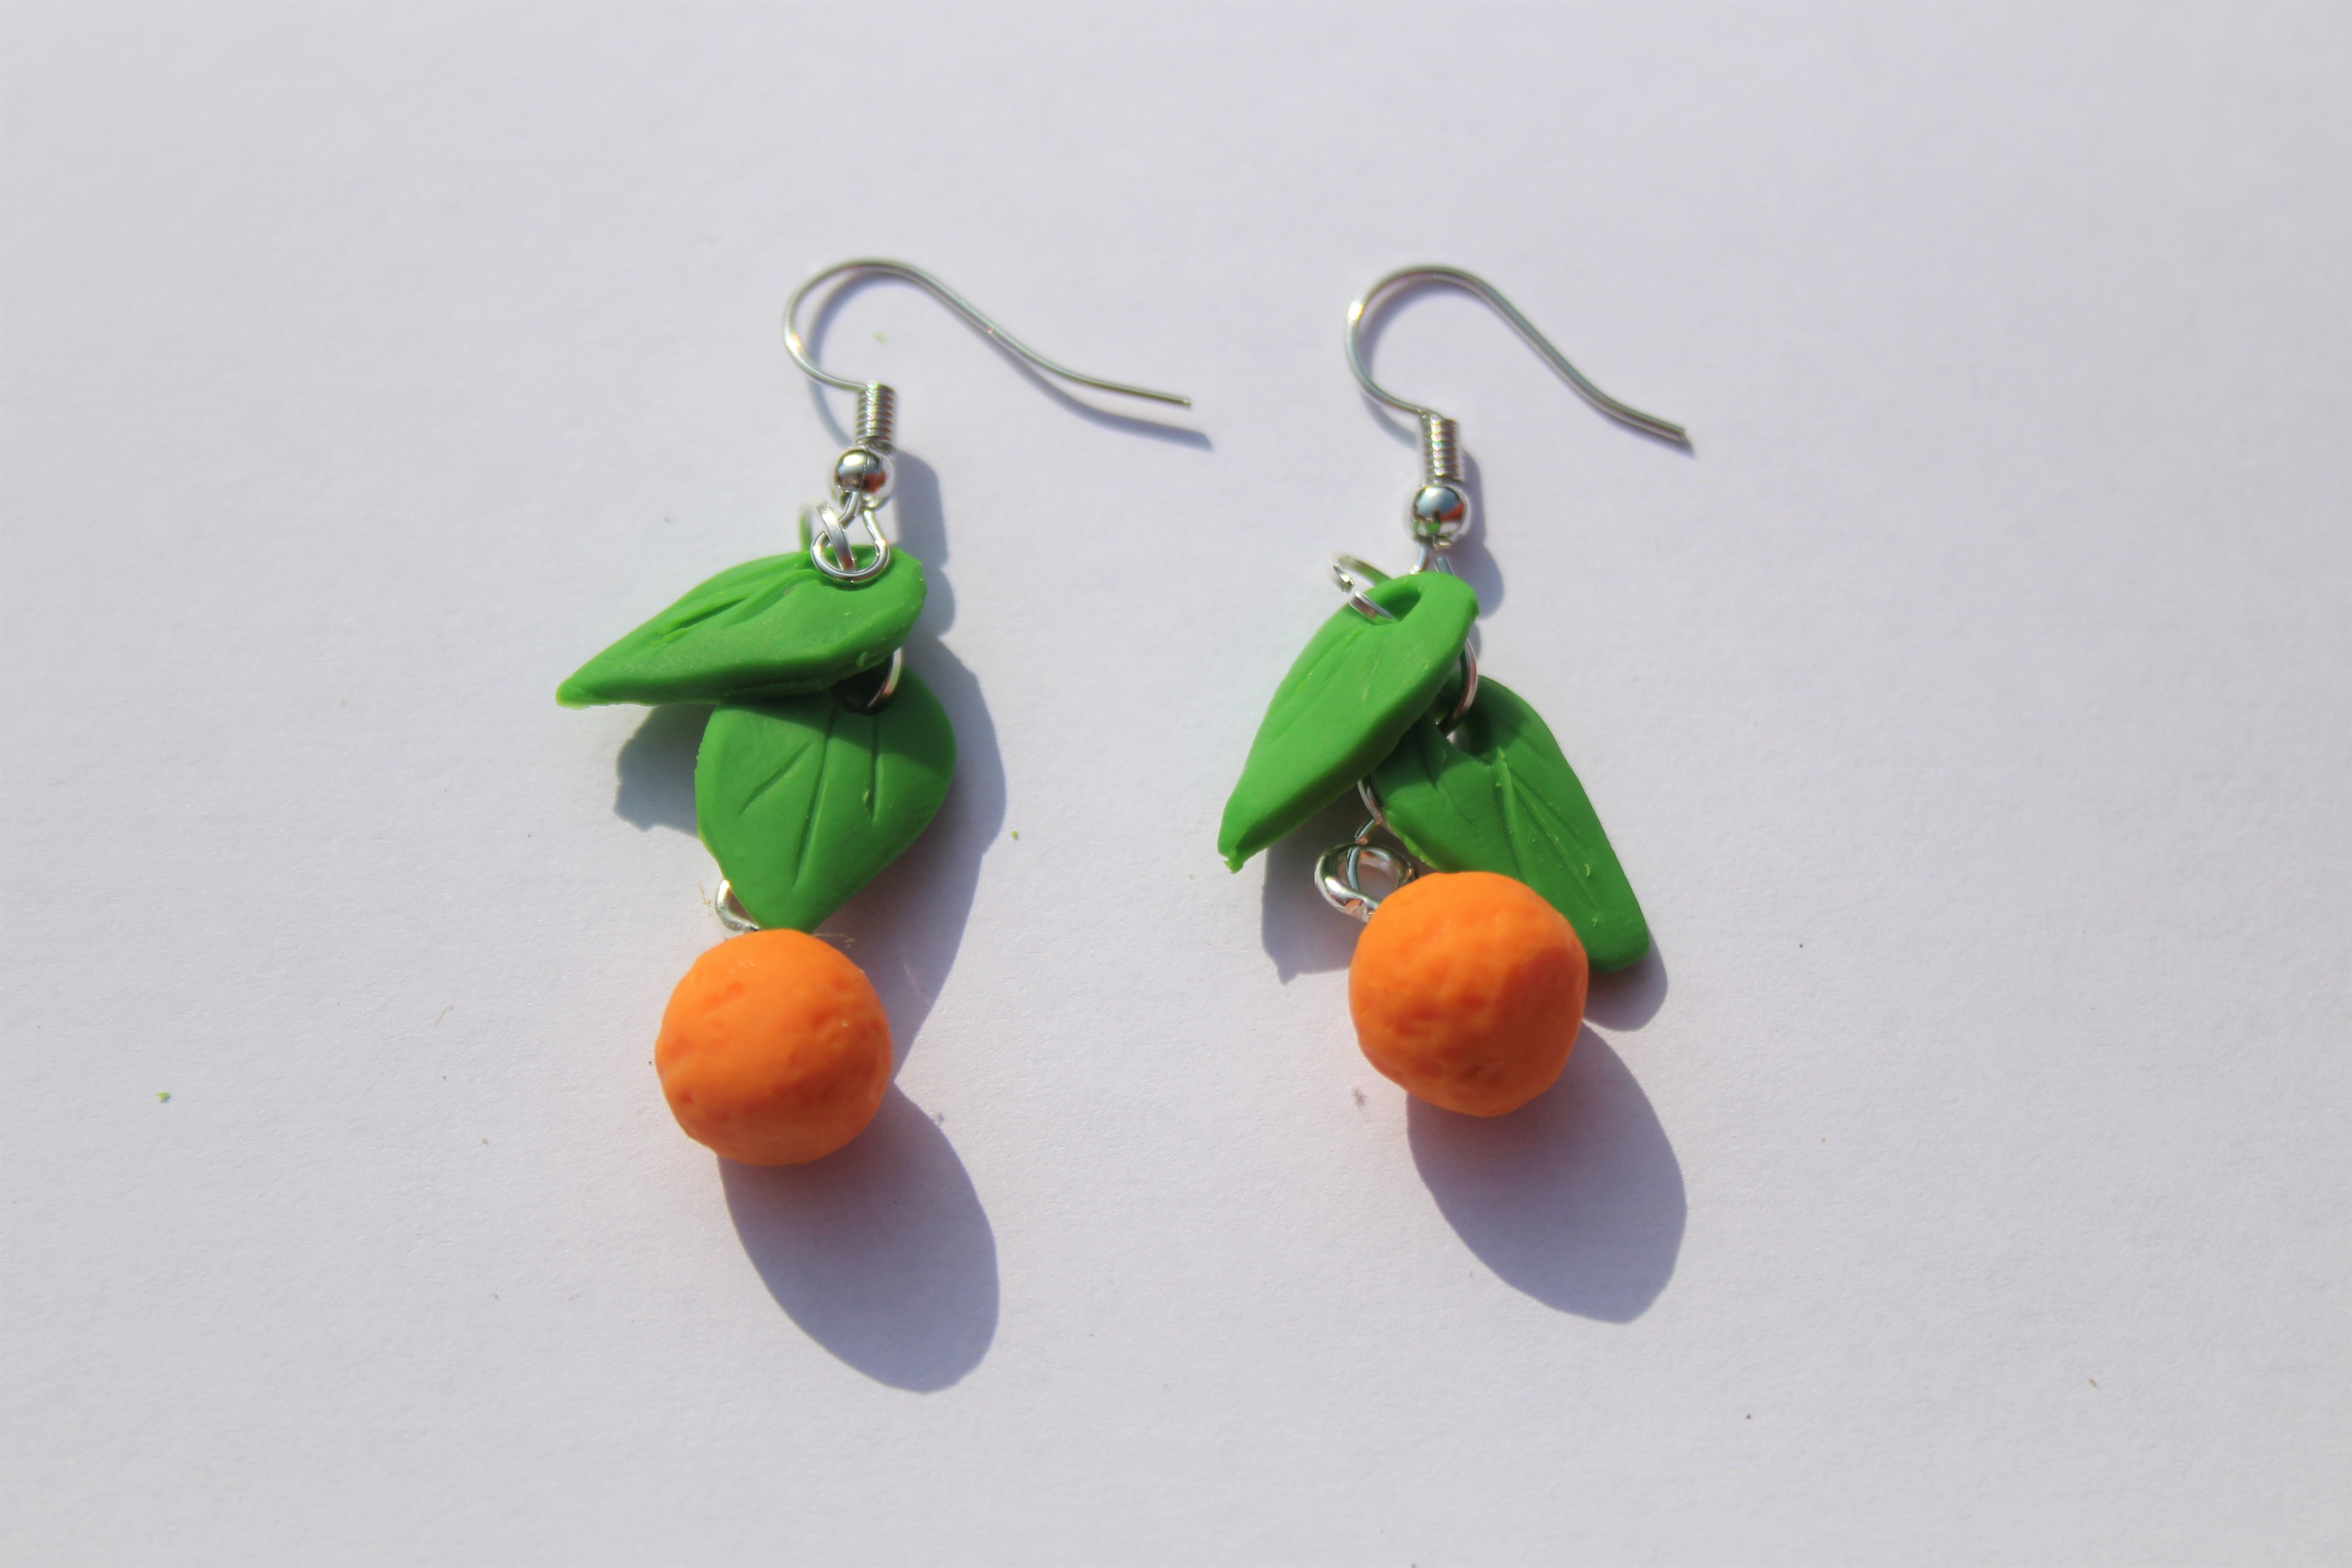 Cute Citrus Orange Earrings Handmade Polymer Clay